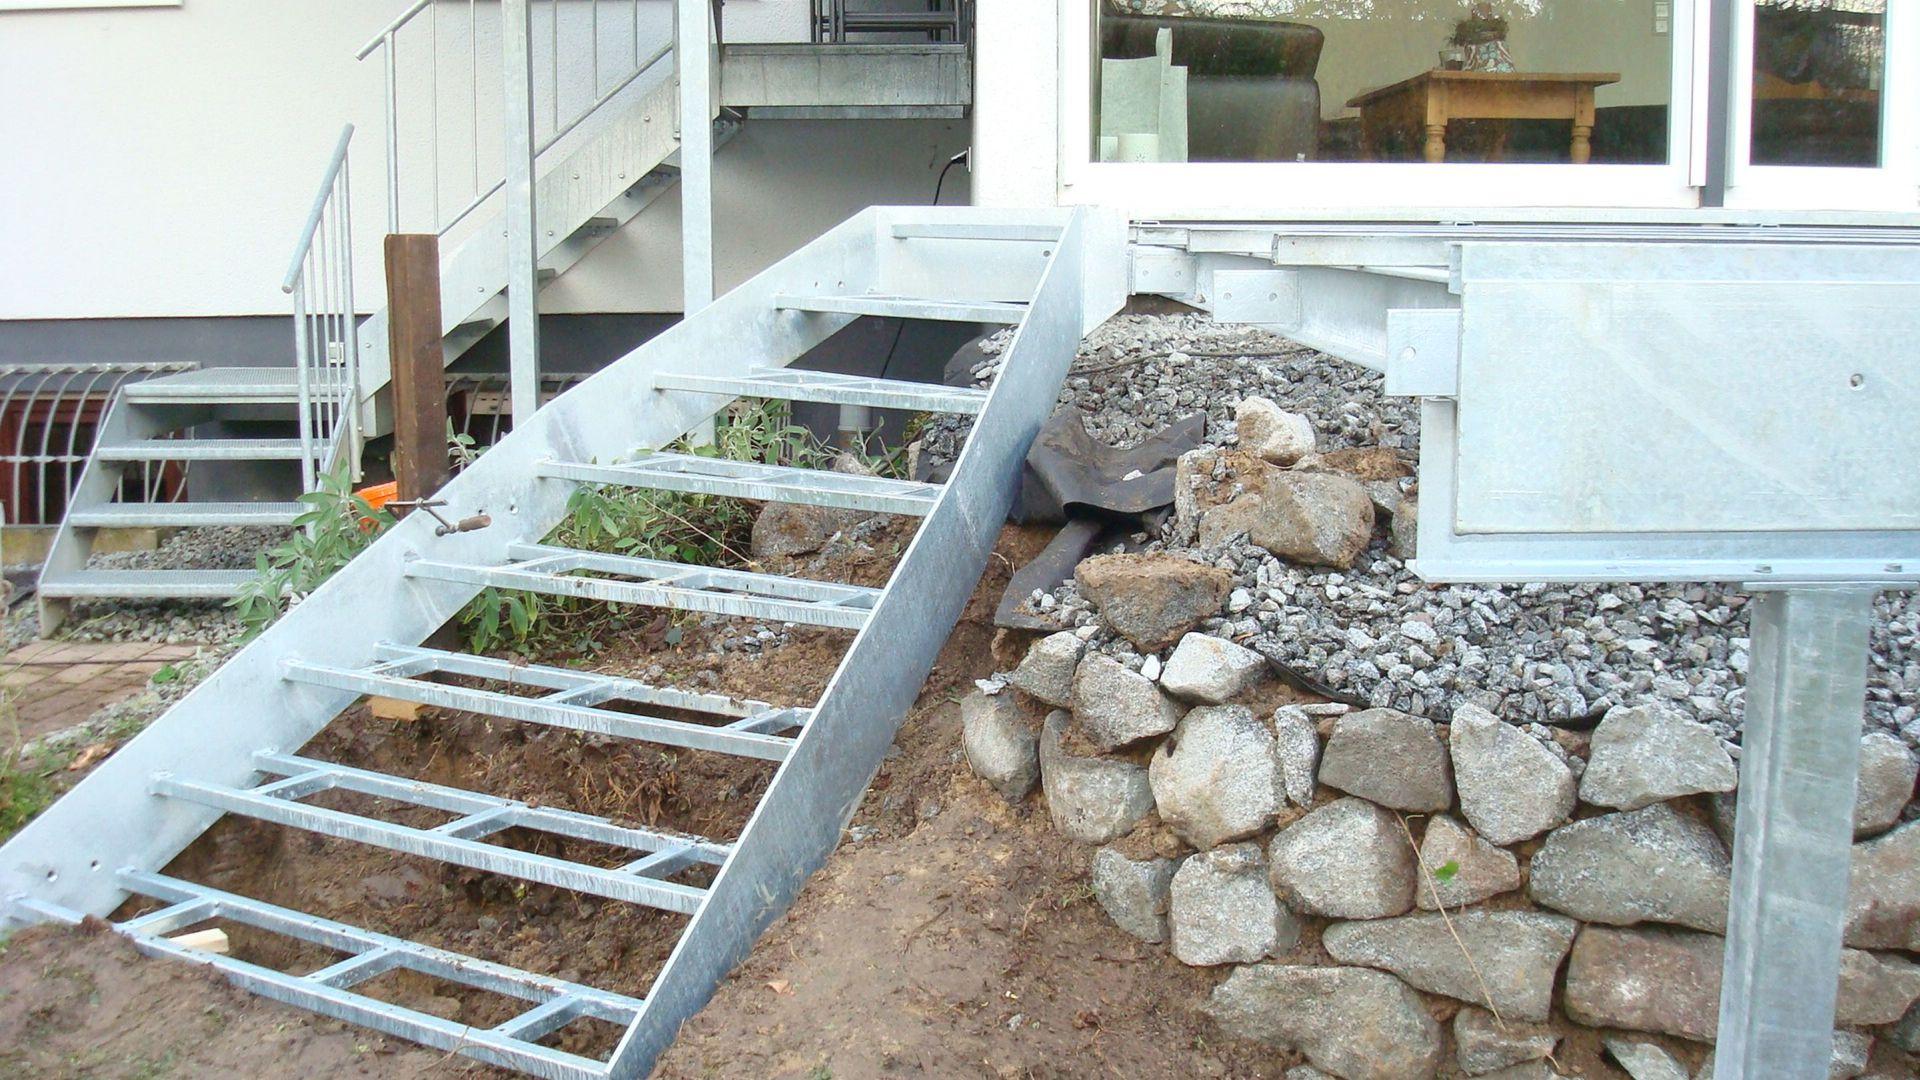 069--Balkon-Gelaender-Montage.JPG